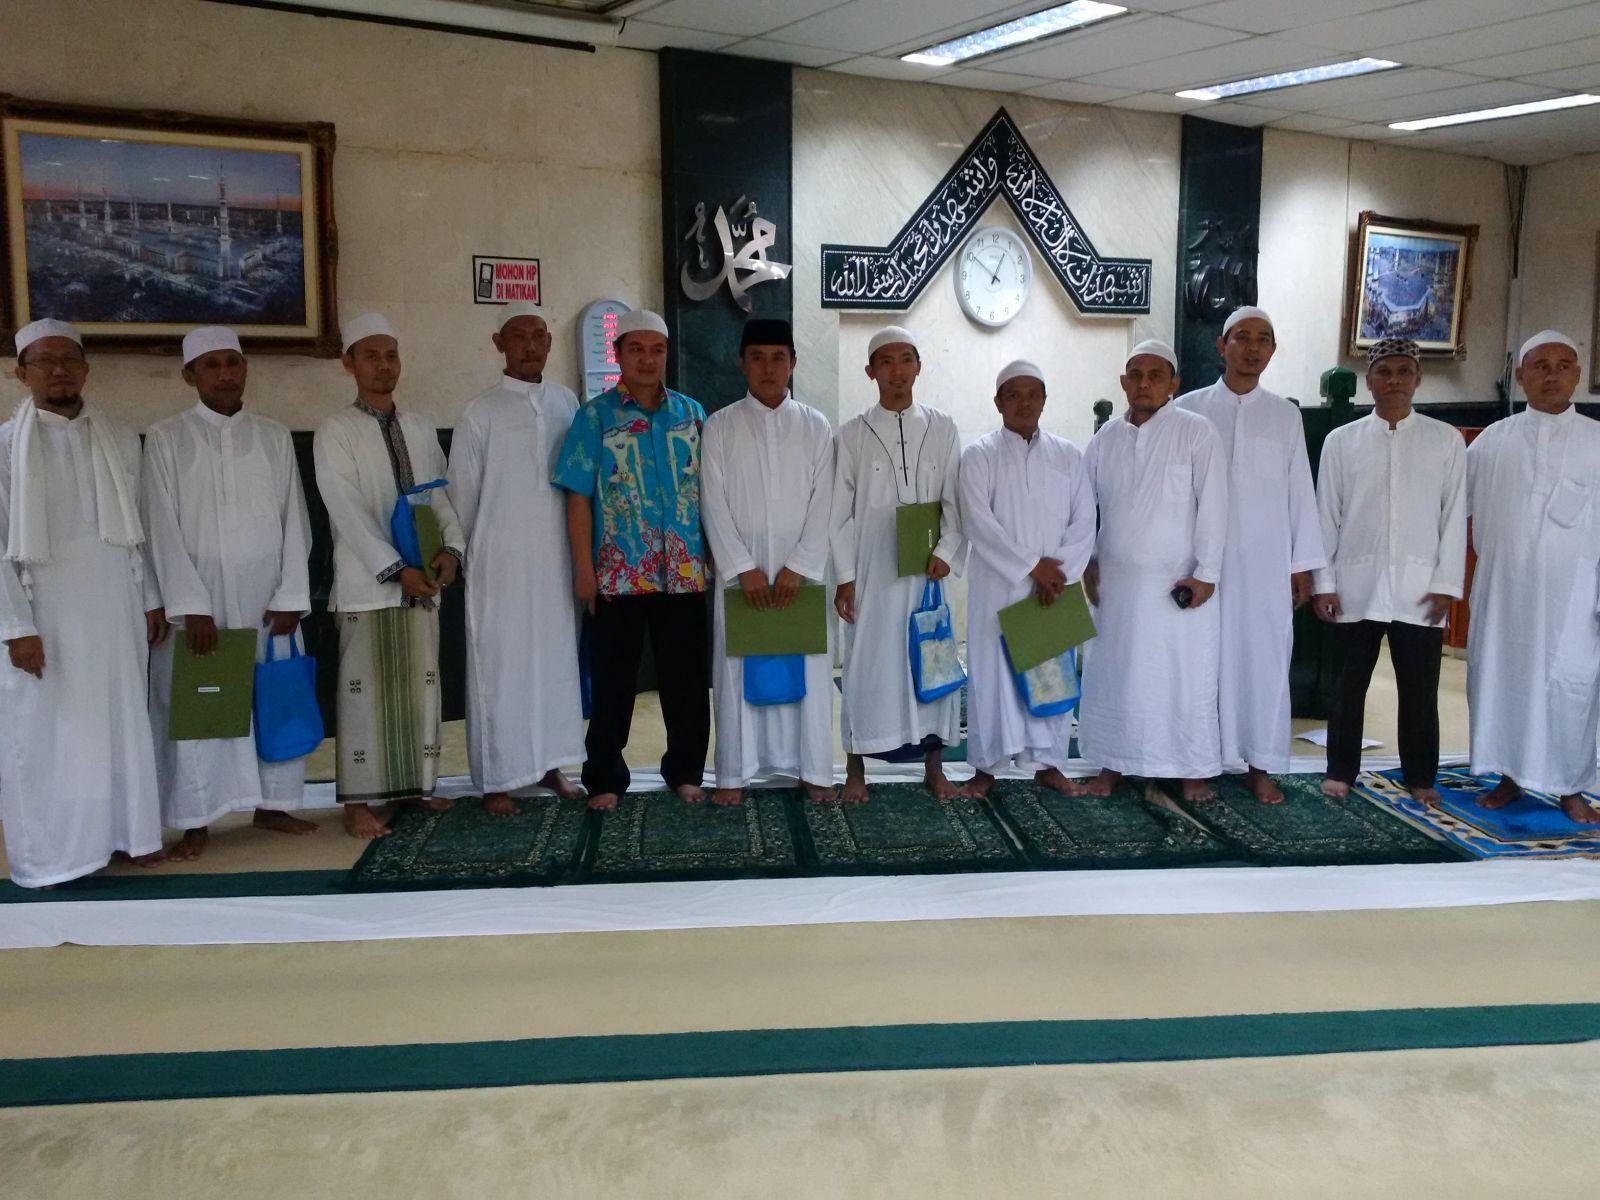 Lomba Azan Masjid Al-Badar Dinas Teknis Abdul Muis